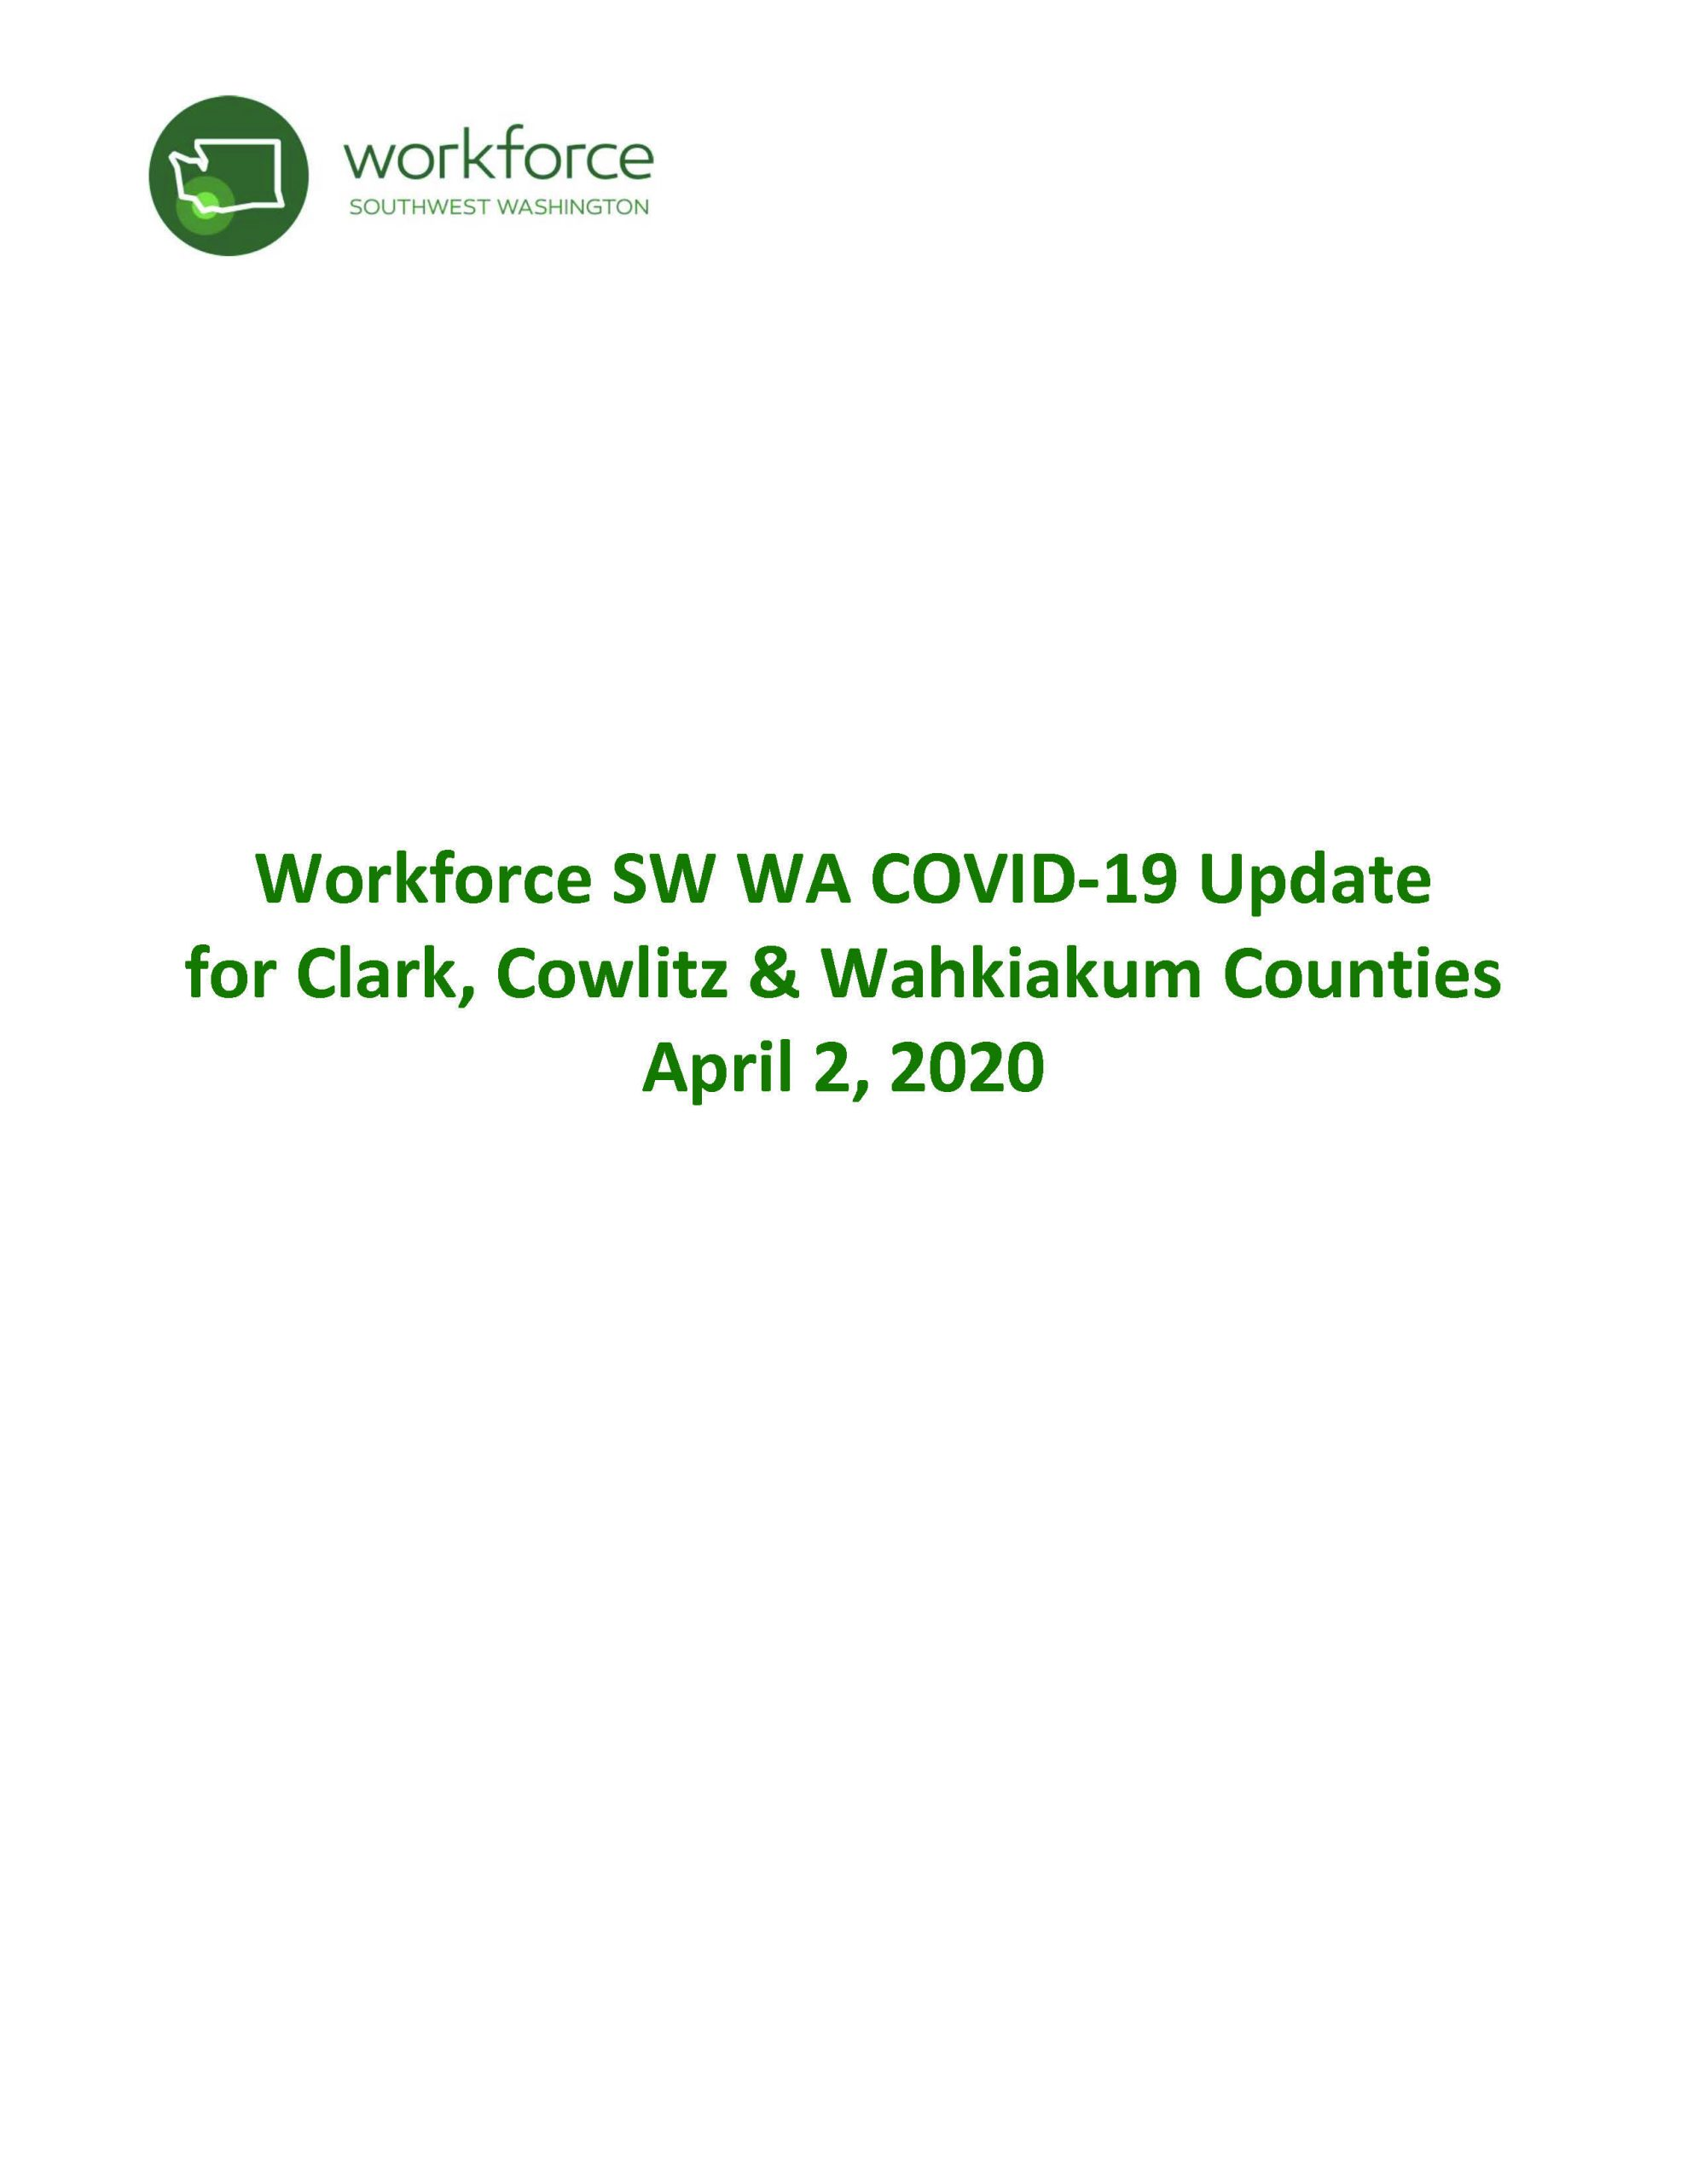 04-2-20-wsw-covid-19-impact-report-cover